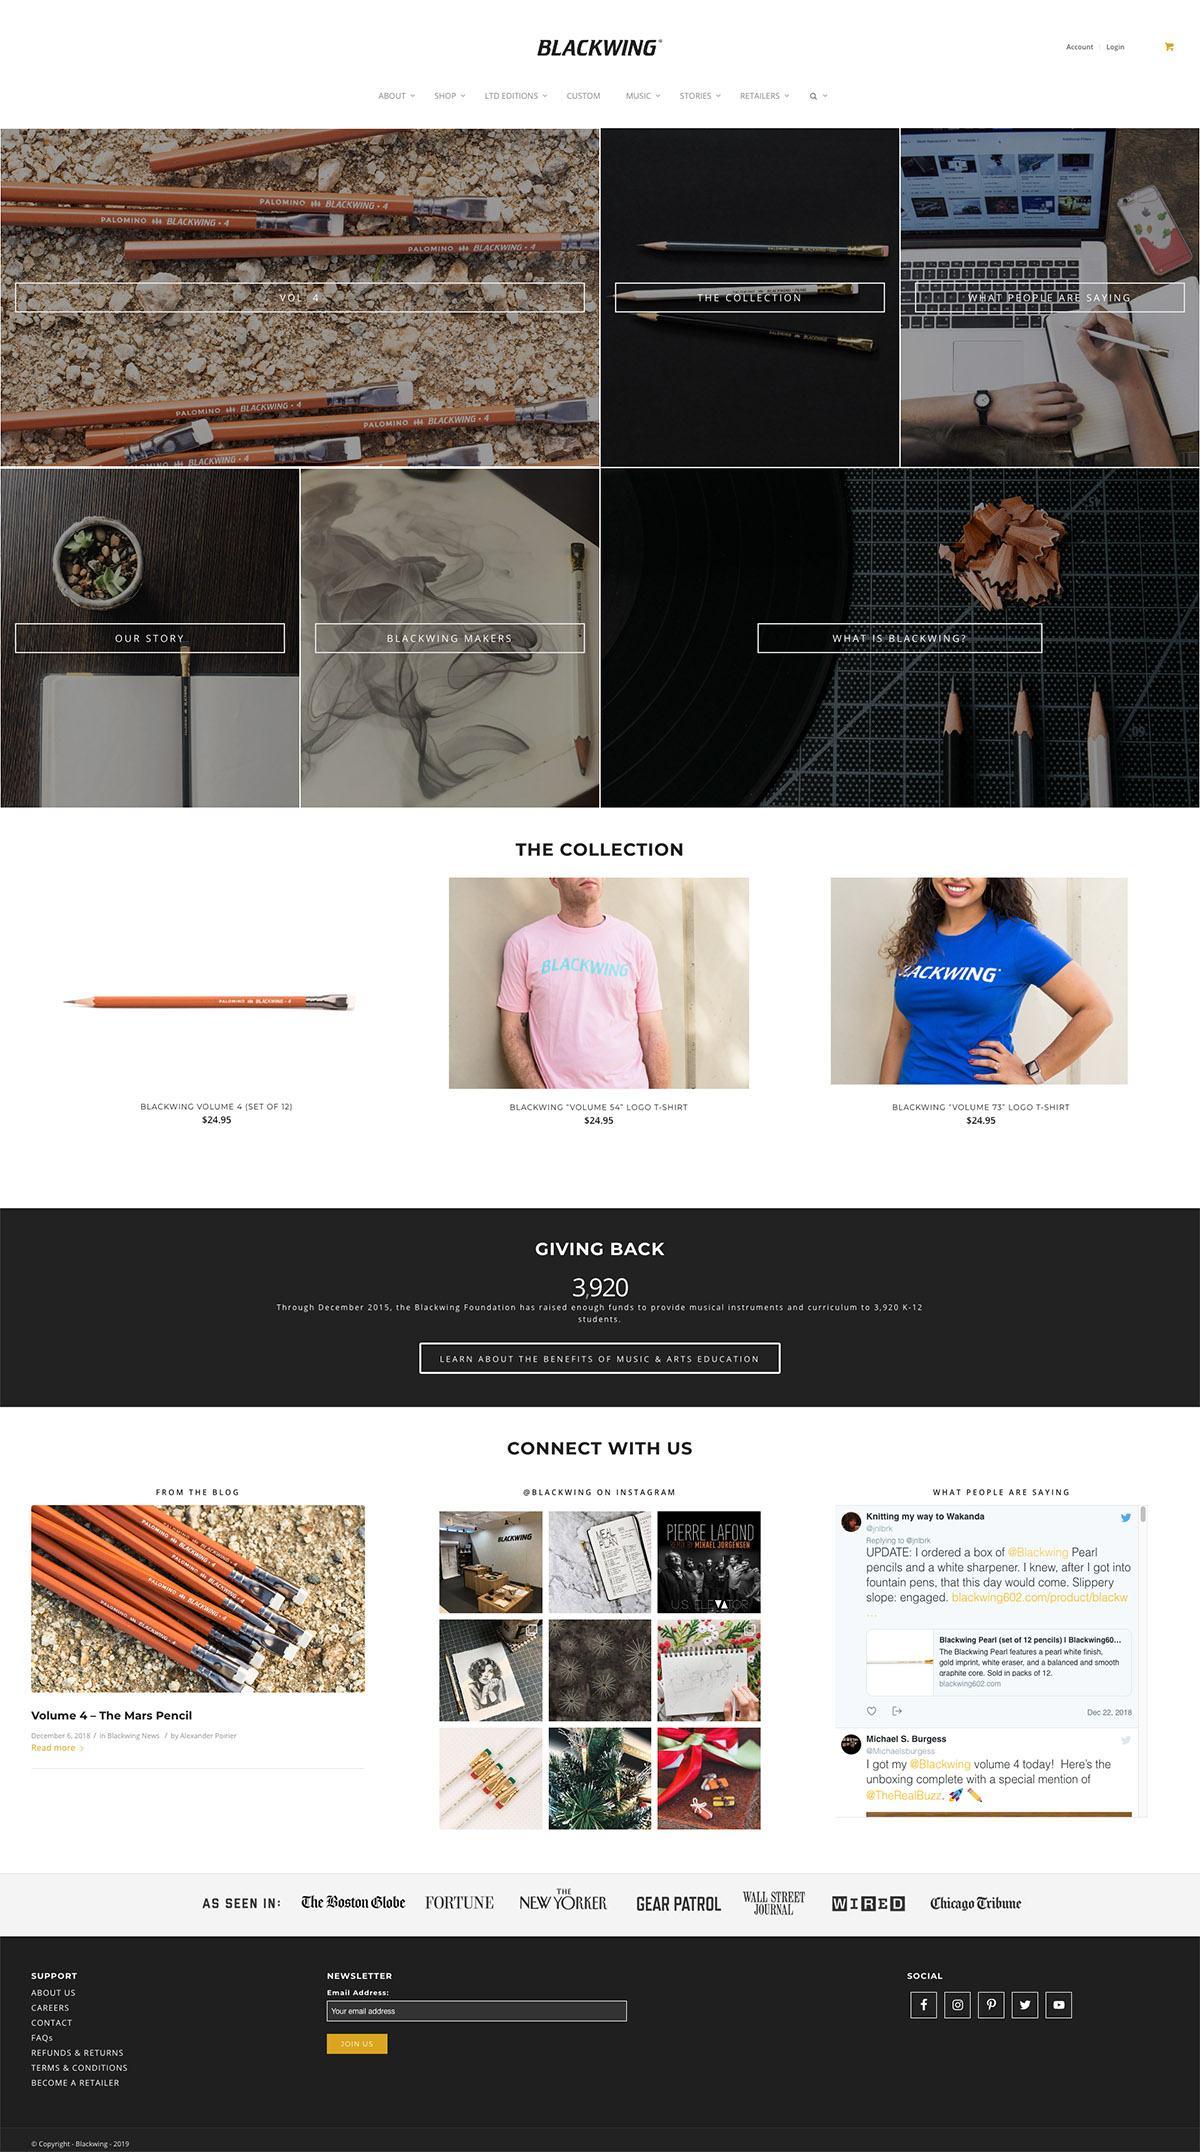 eCommerce website: Blackwing